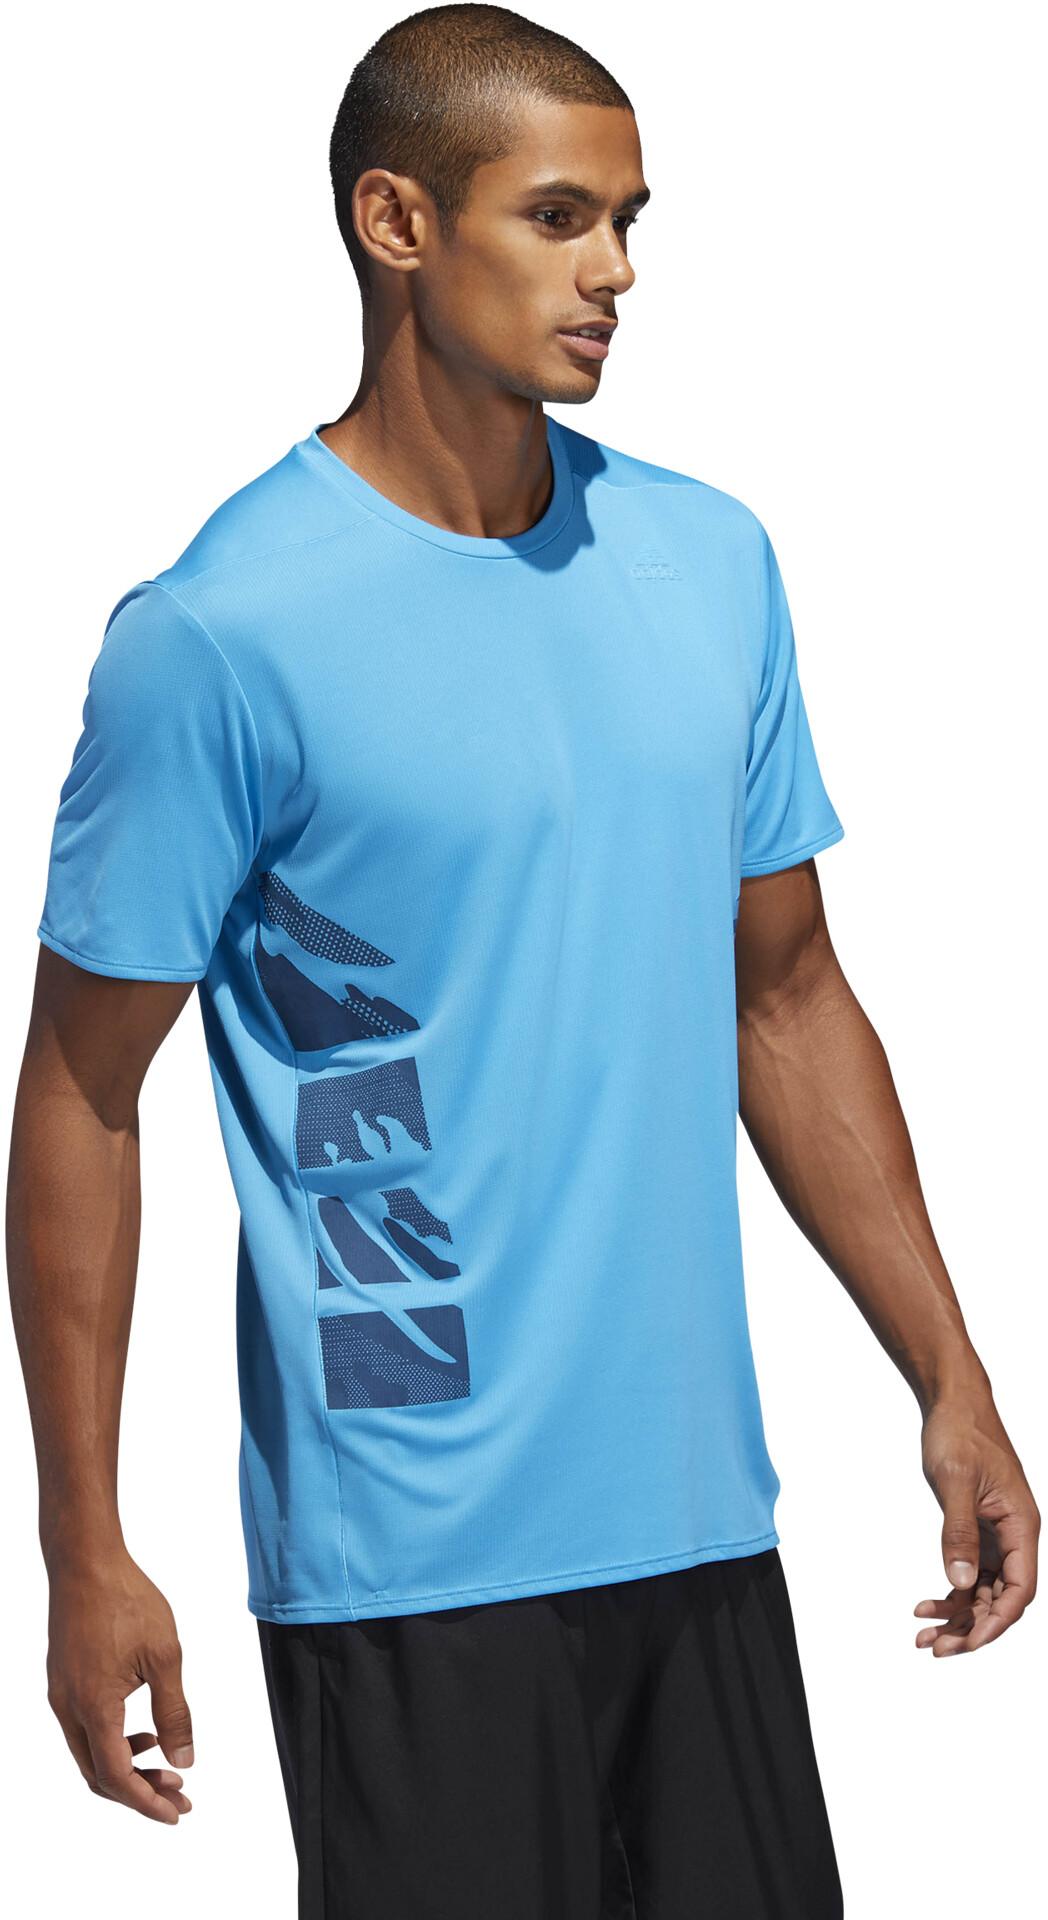 dde4fc0f adidas Supernova Løbe T-shirt Herrer, shock cyan | Find outdoortøj ...